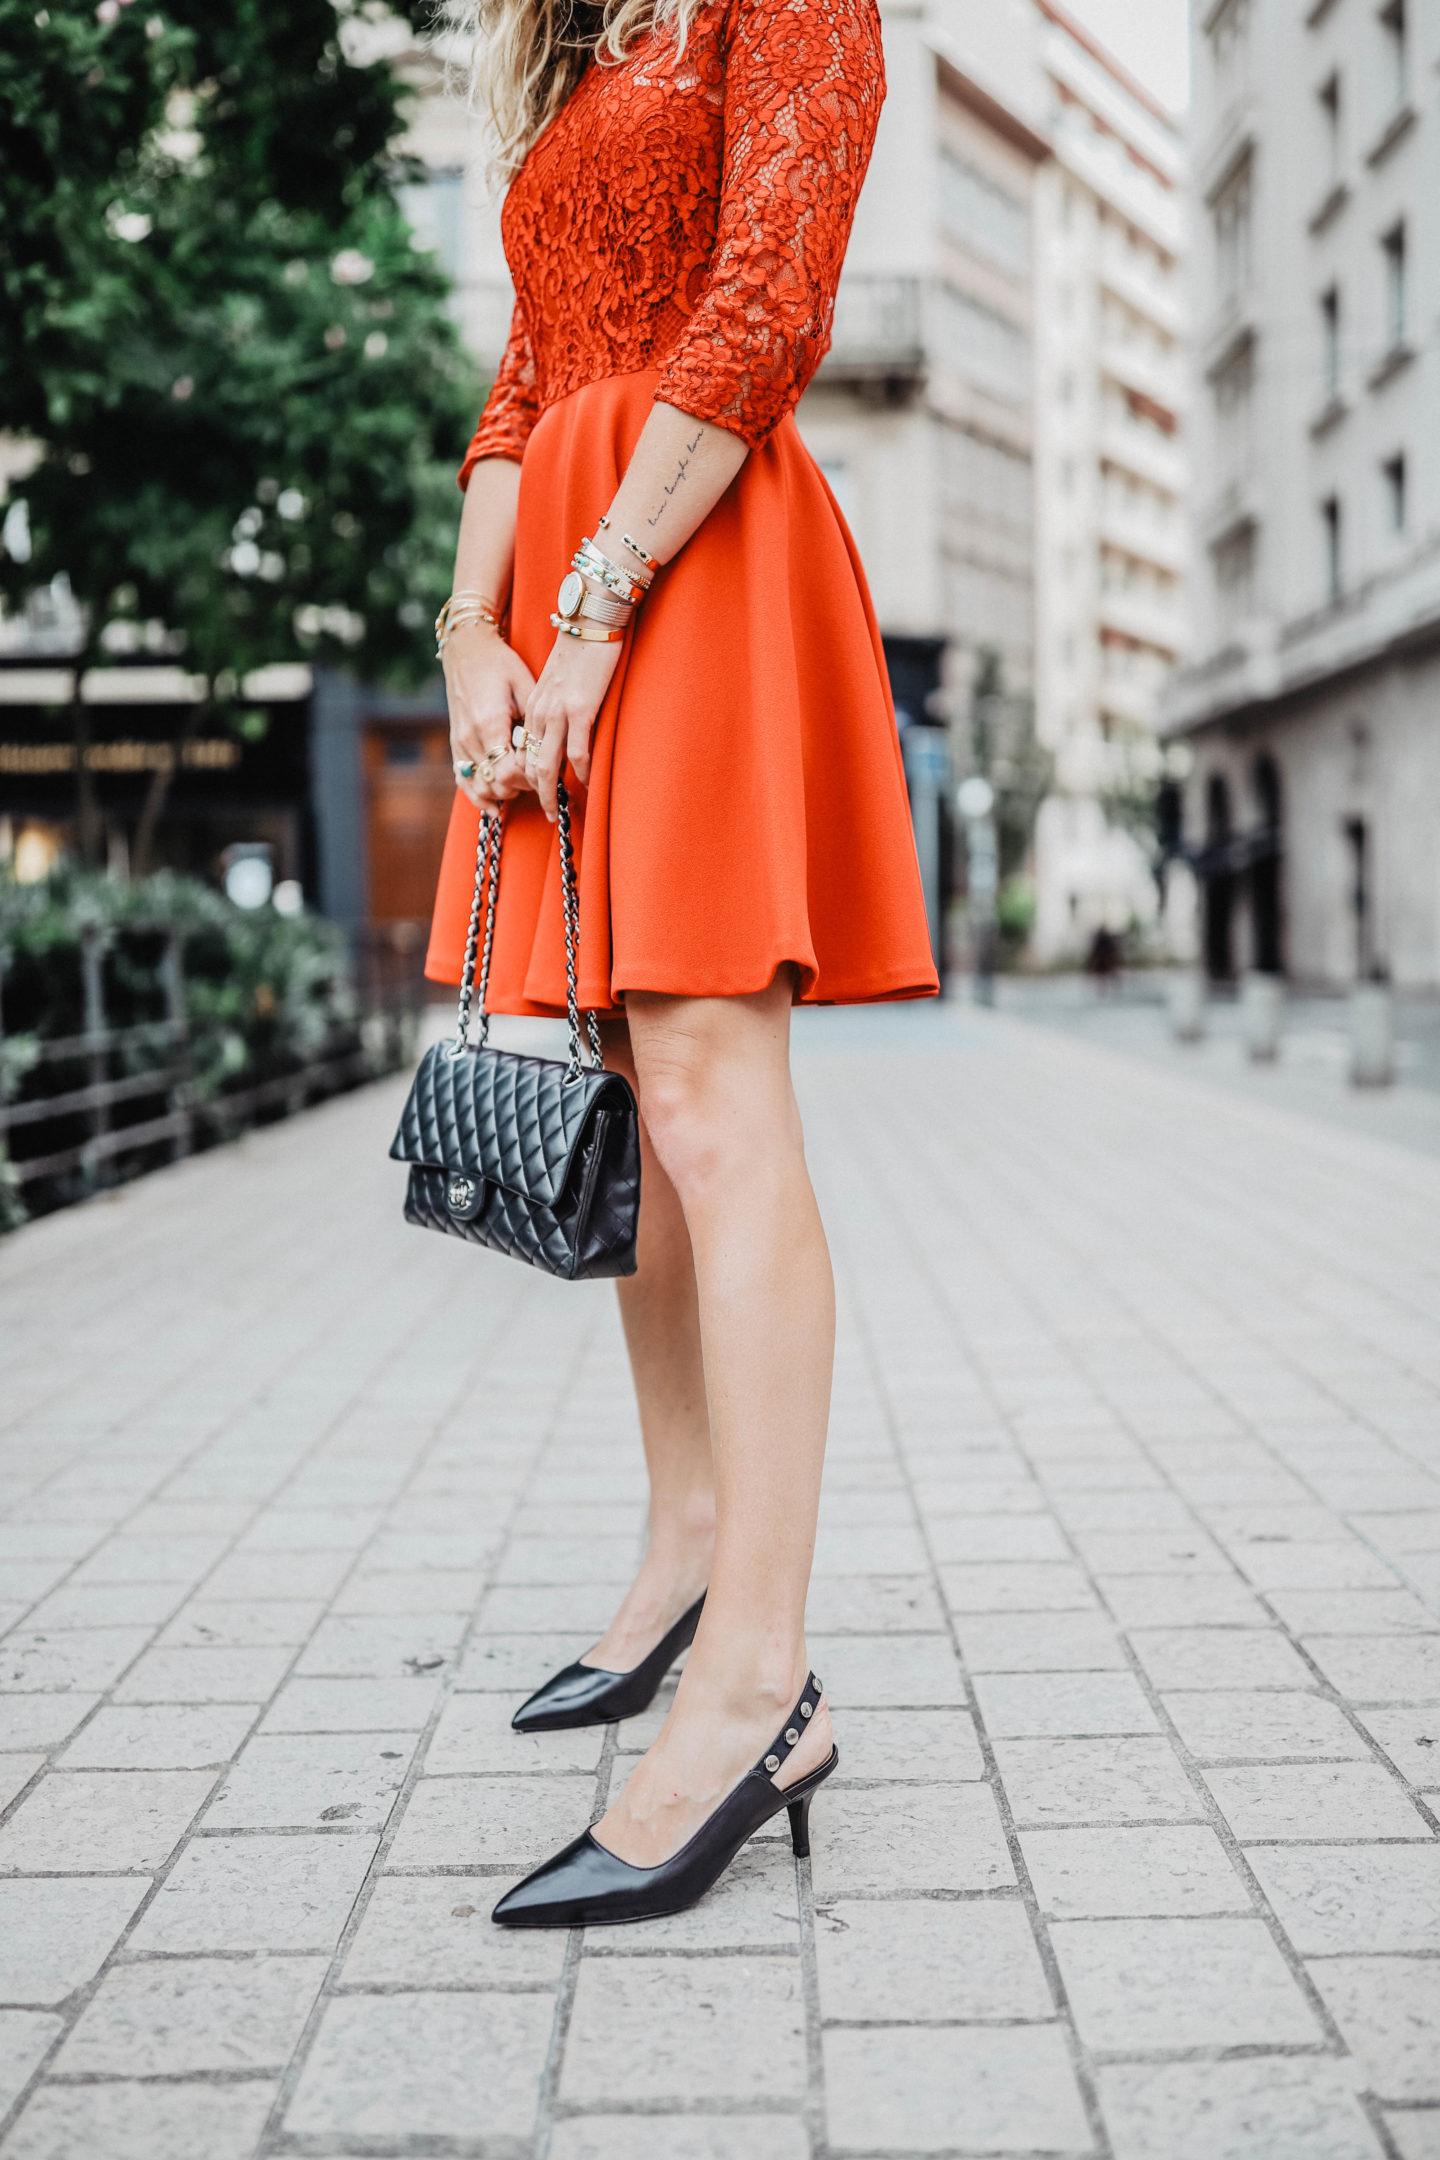 Escarpins Claudie Pierlot marie and mood blog